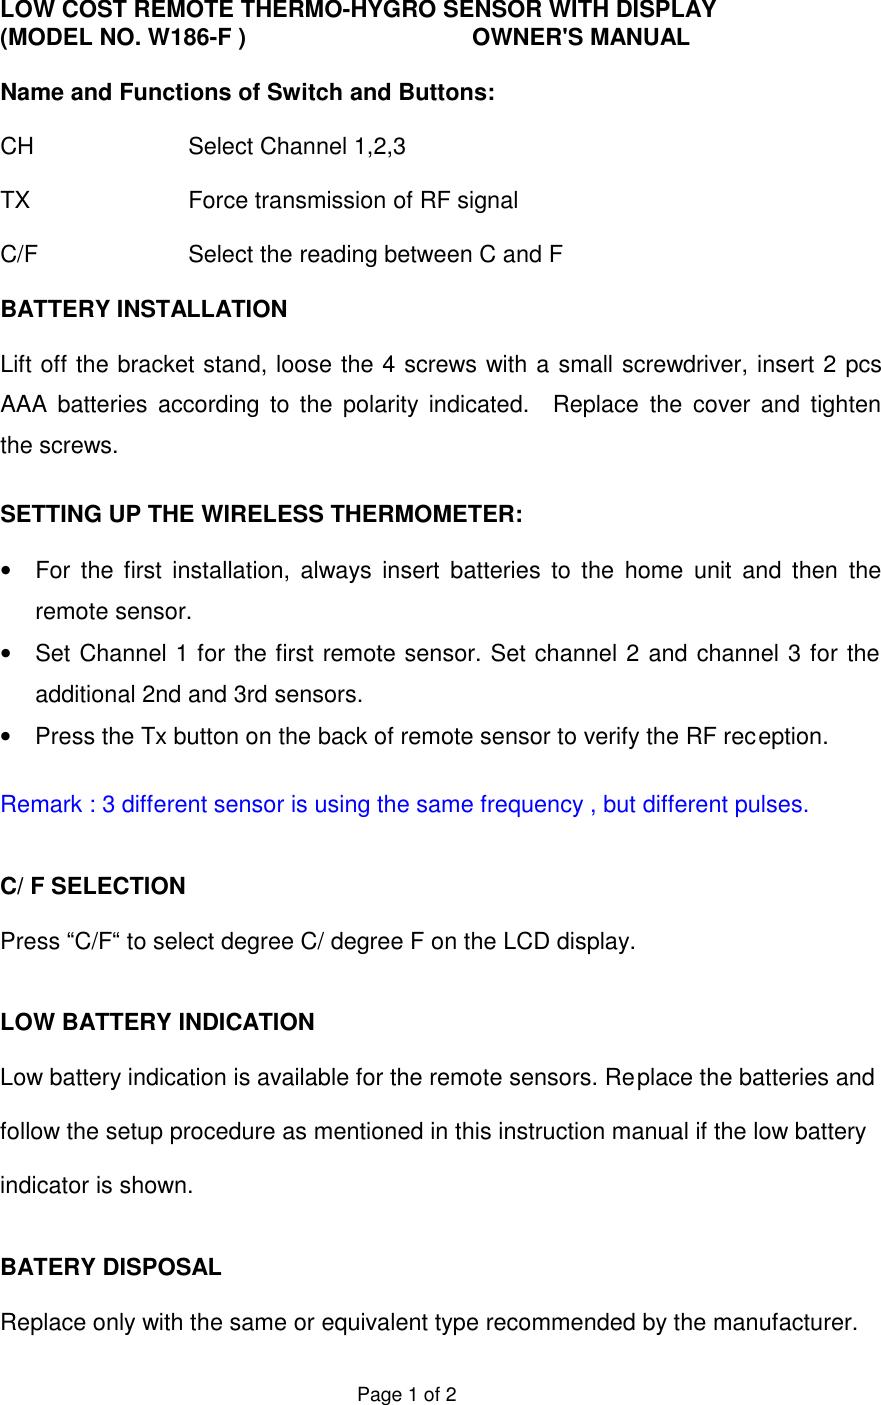 hl206 user manual user manual guide u2022 rh userguidedirect today